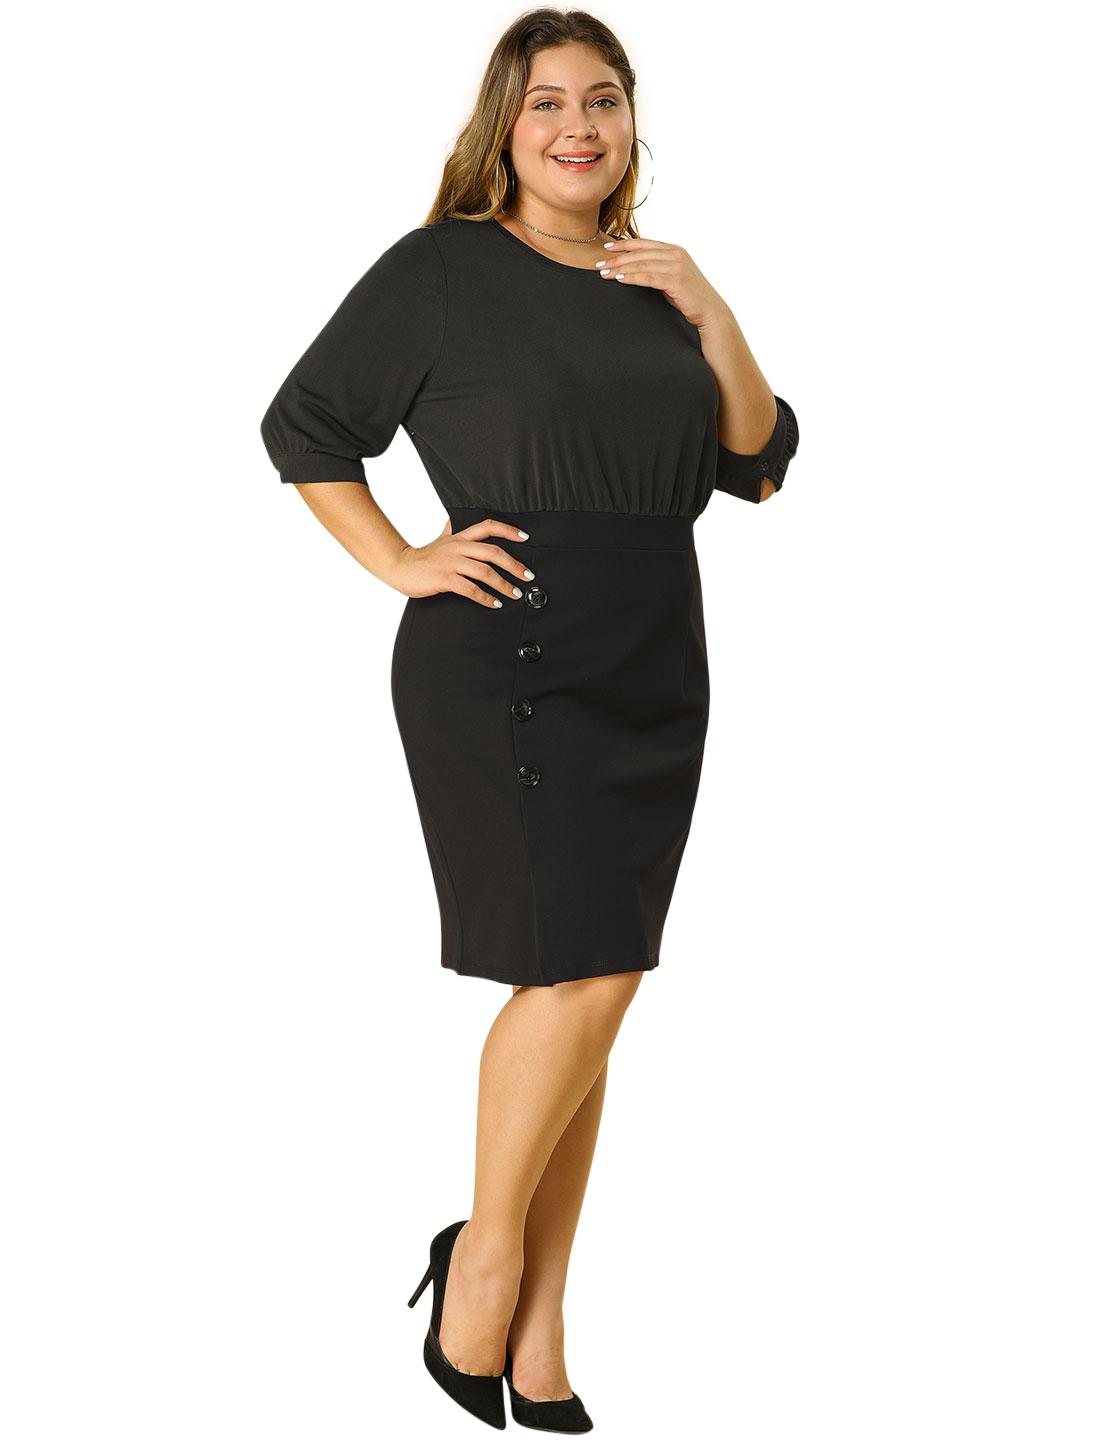 Women's Plus Size Office Work Bodycon Button Pencil Dress Black 4X